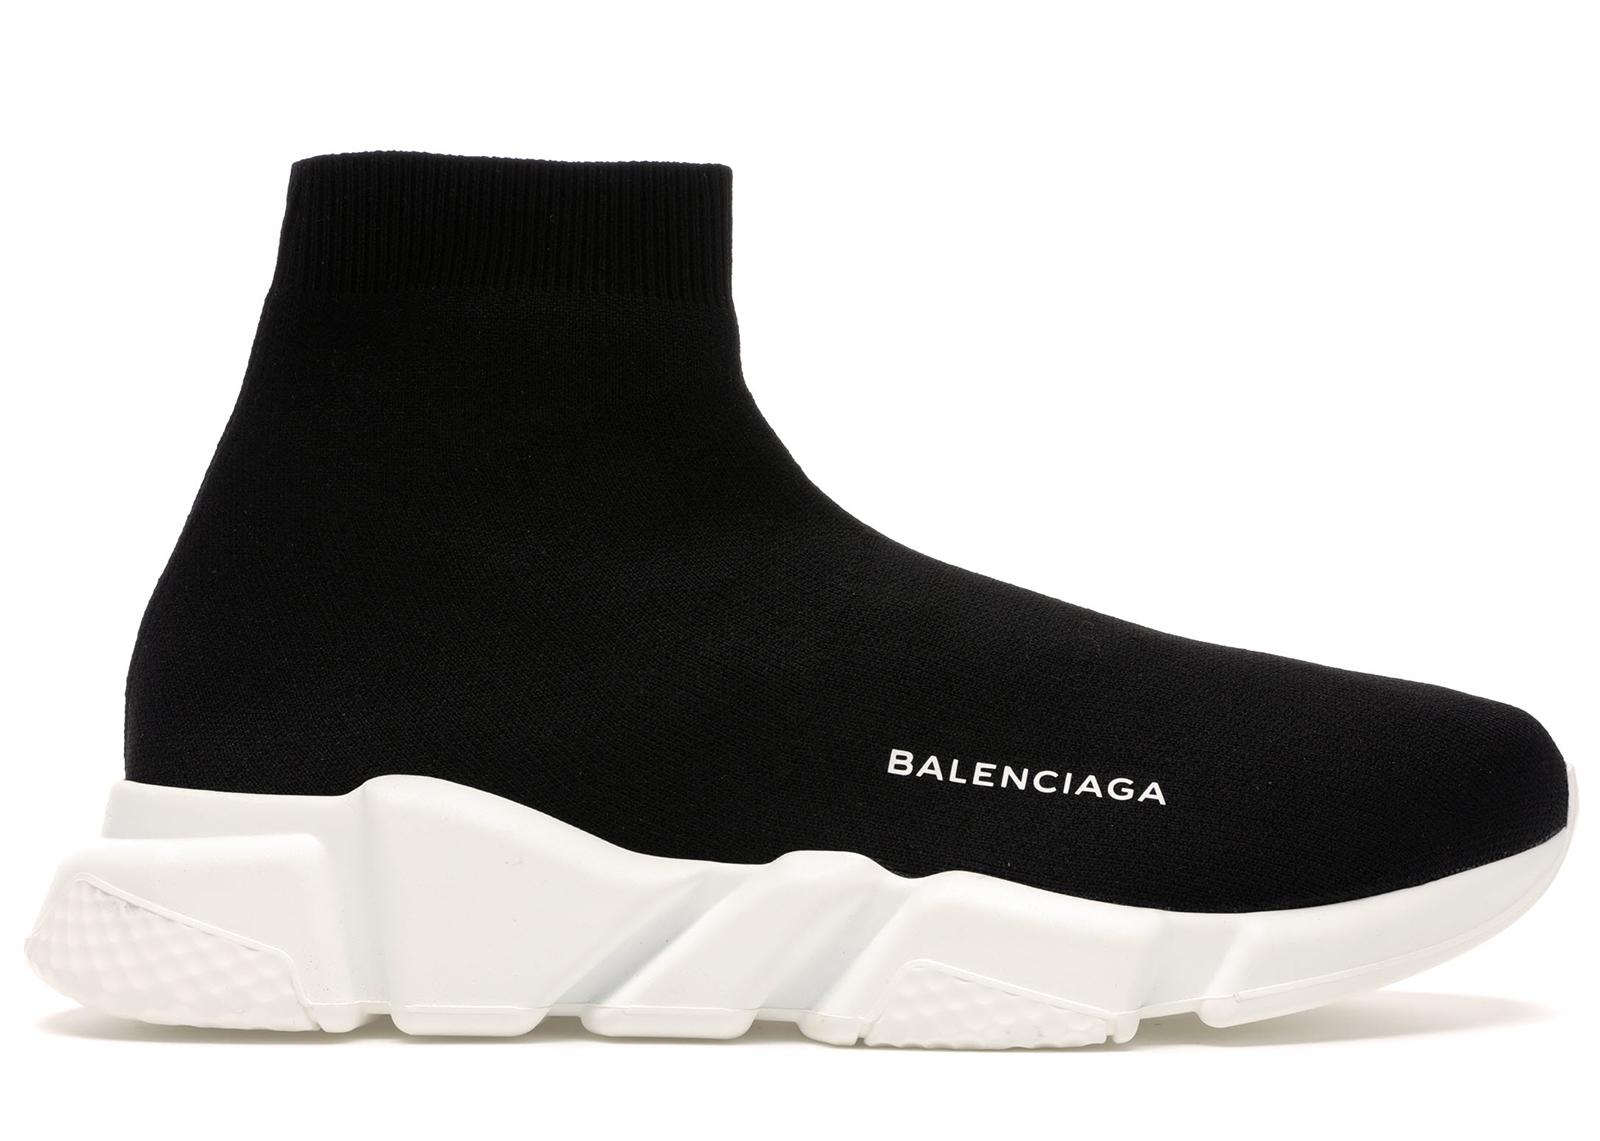 balenciaga sock shoes colors